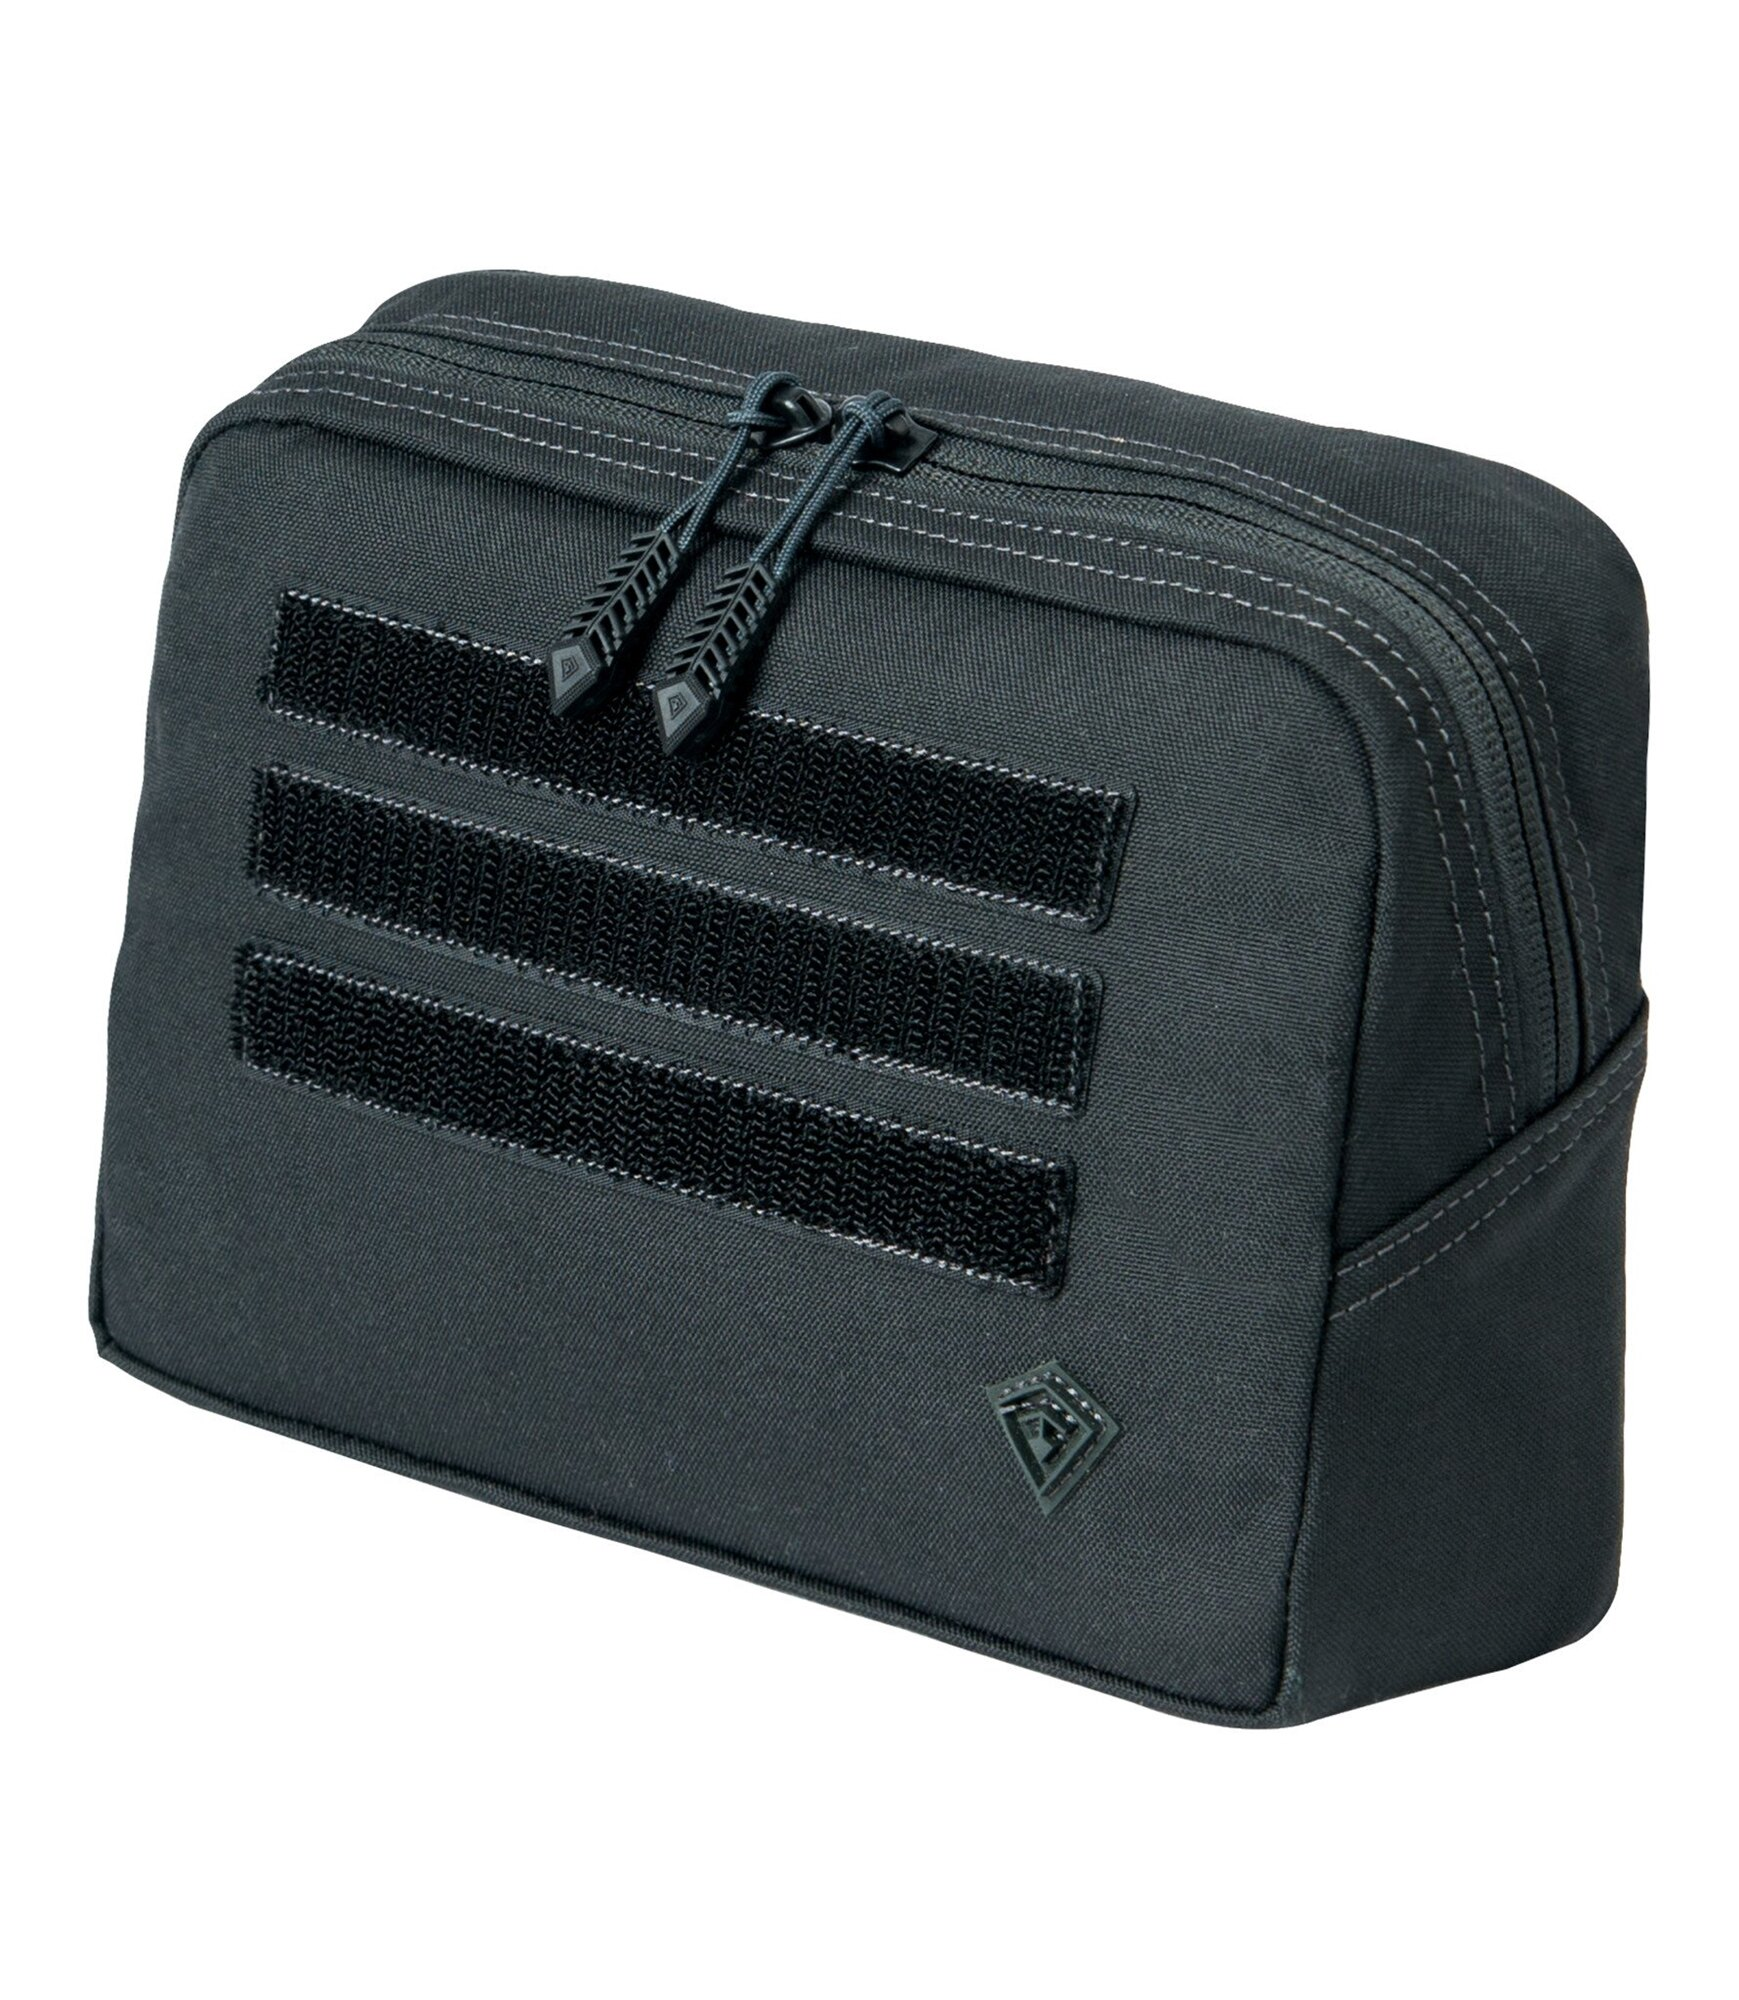 Puzdro Tactix 9x6 Utility First Tactical® - čierne (Farba: Čierna)